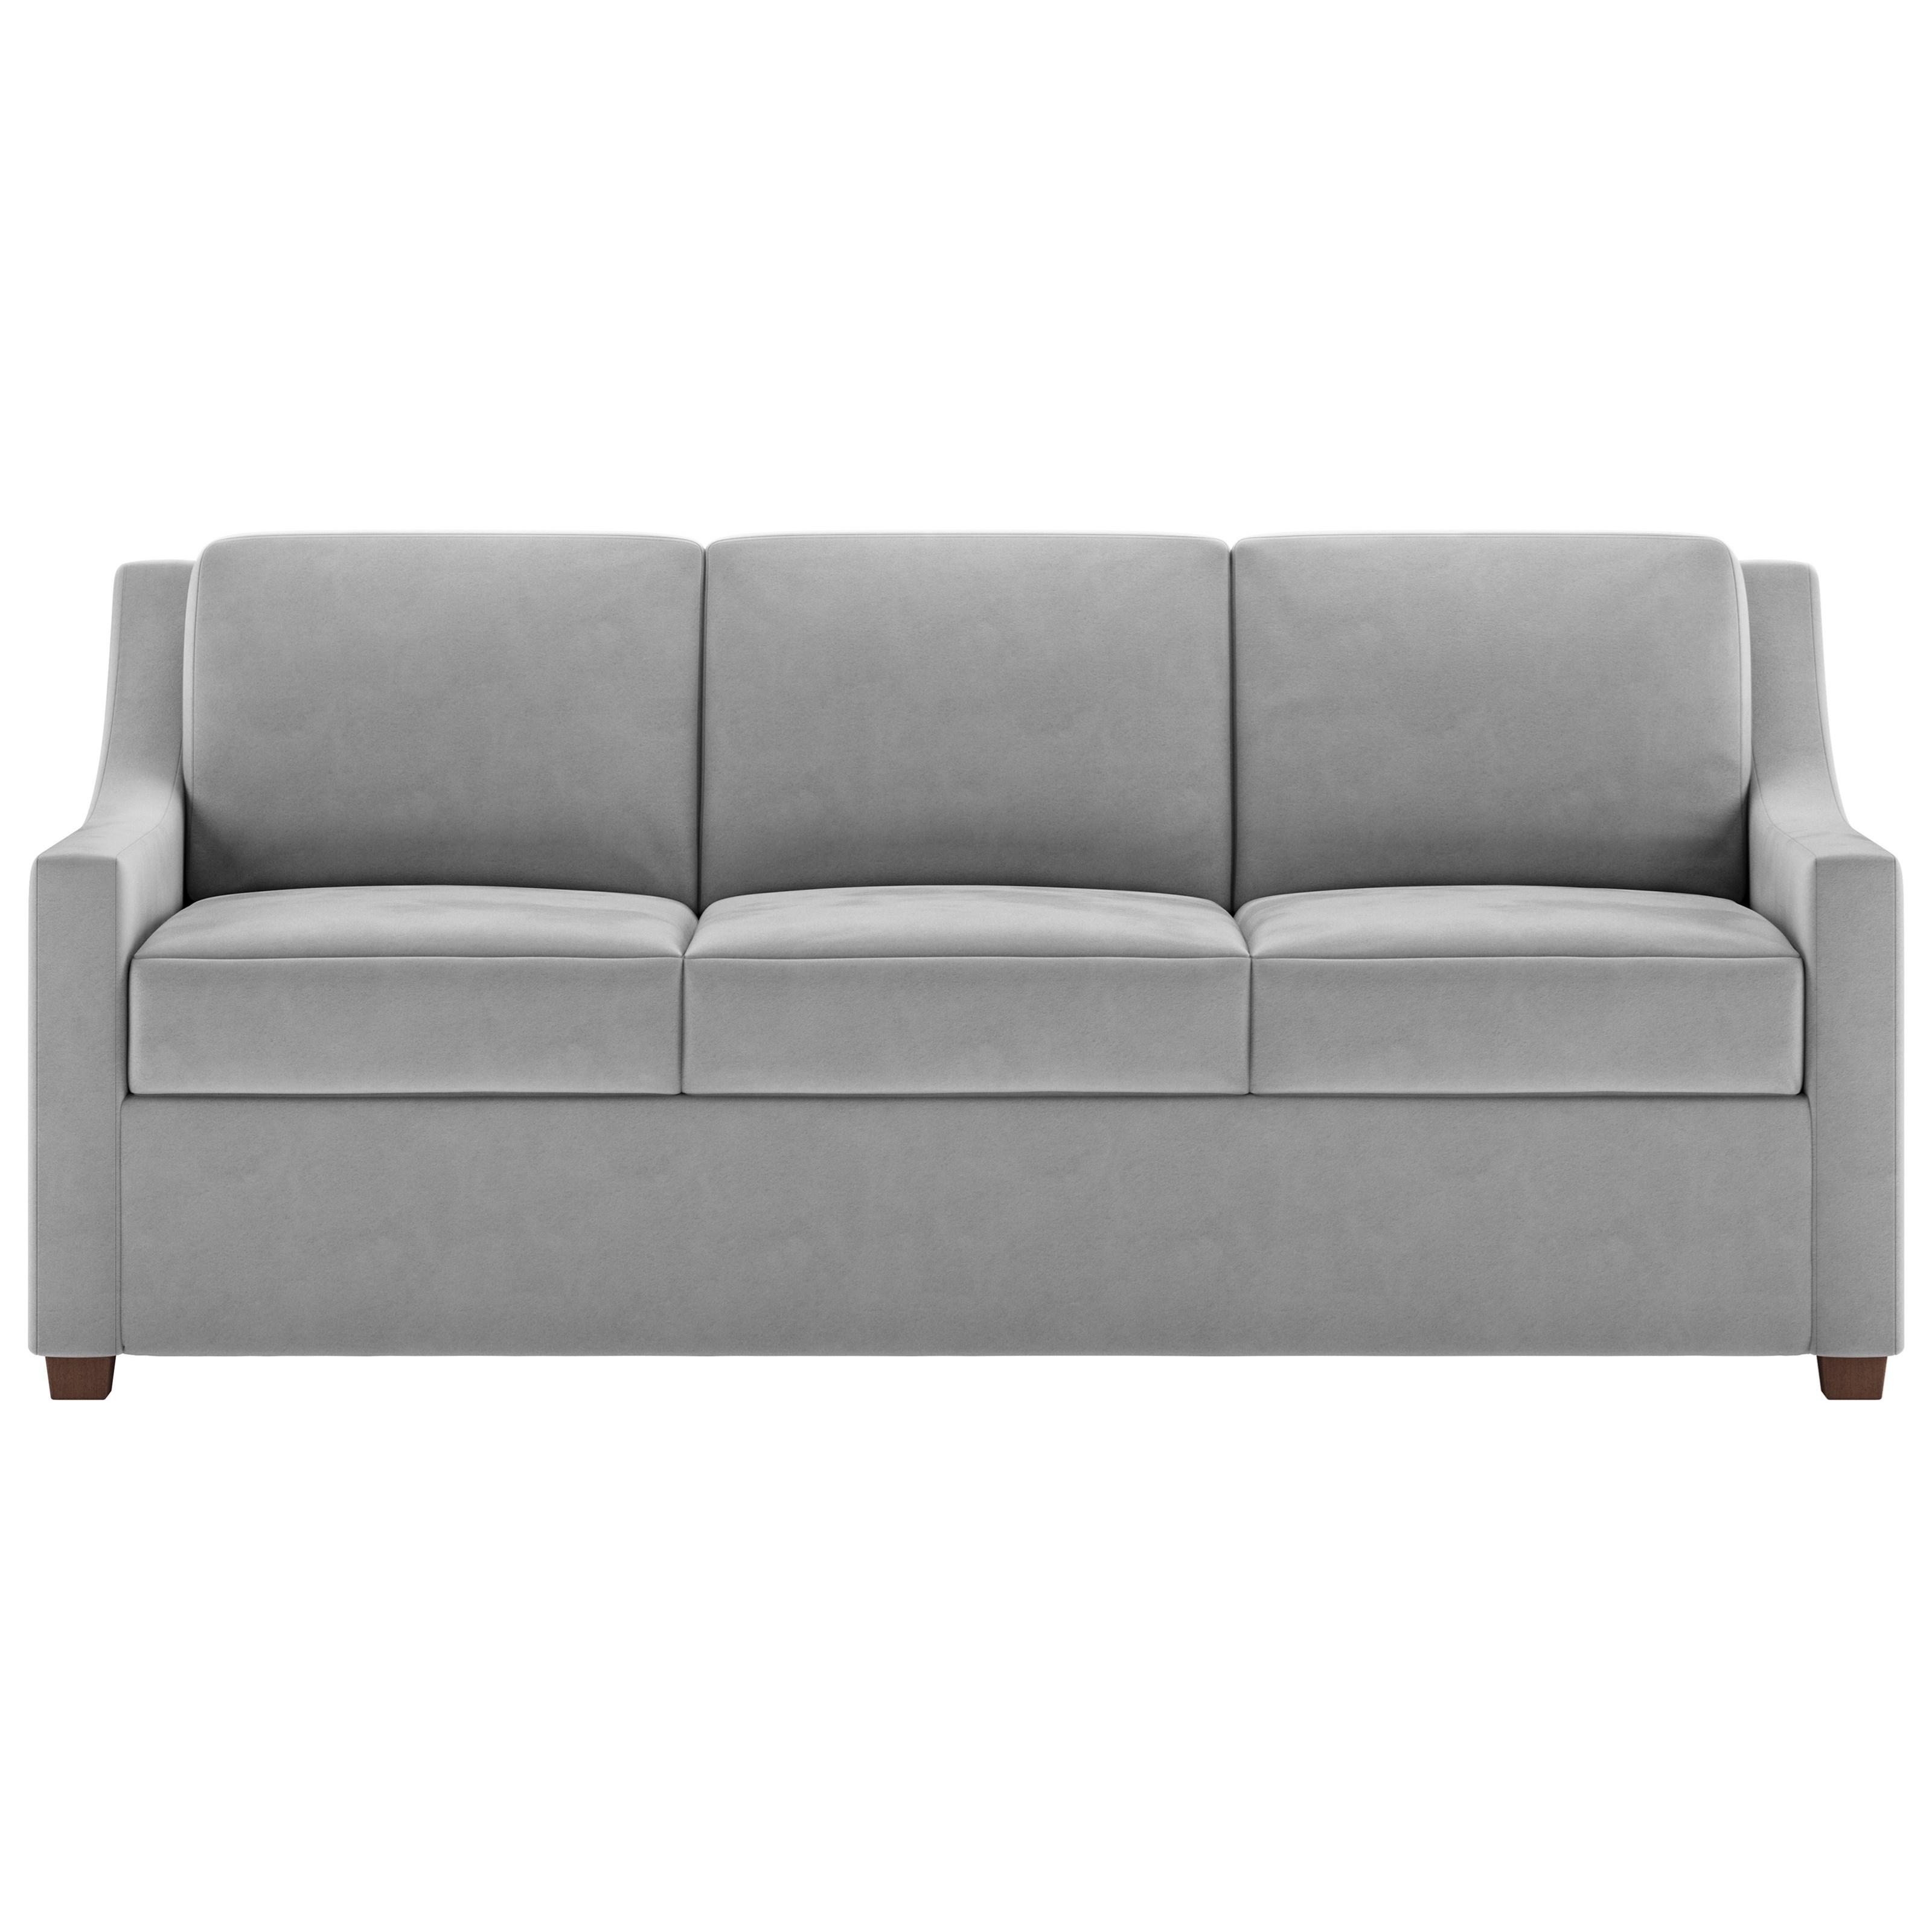 american leather perry king size comfort sleeper sofa sprintz furniture sleeper sofas. Black Bedroom Furniture Sets. Home Design Ideas